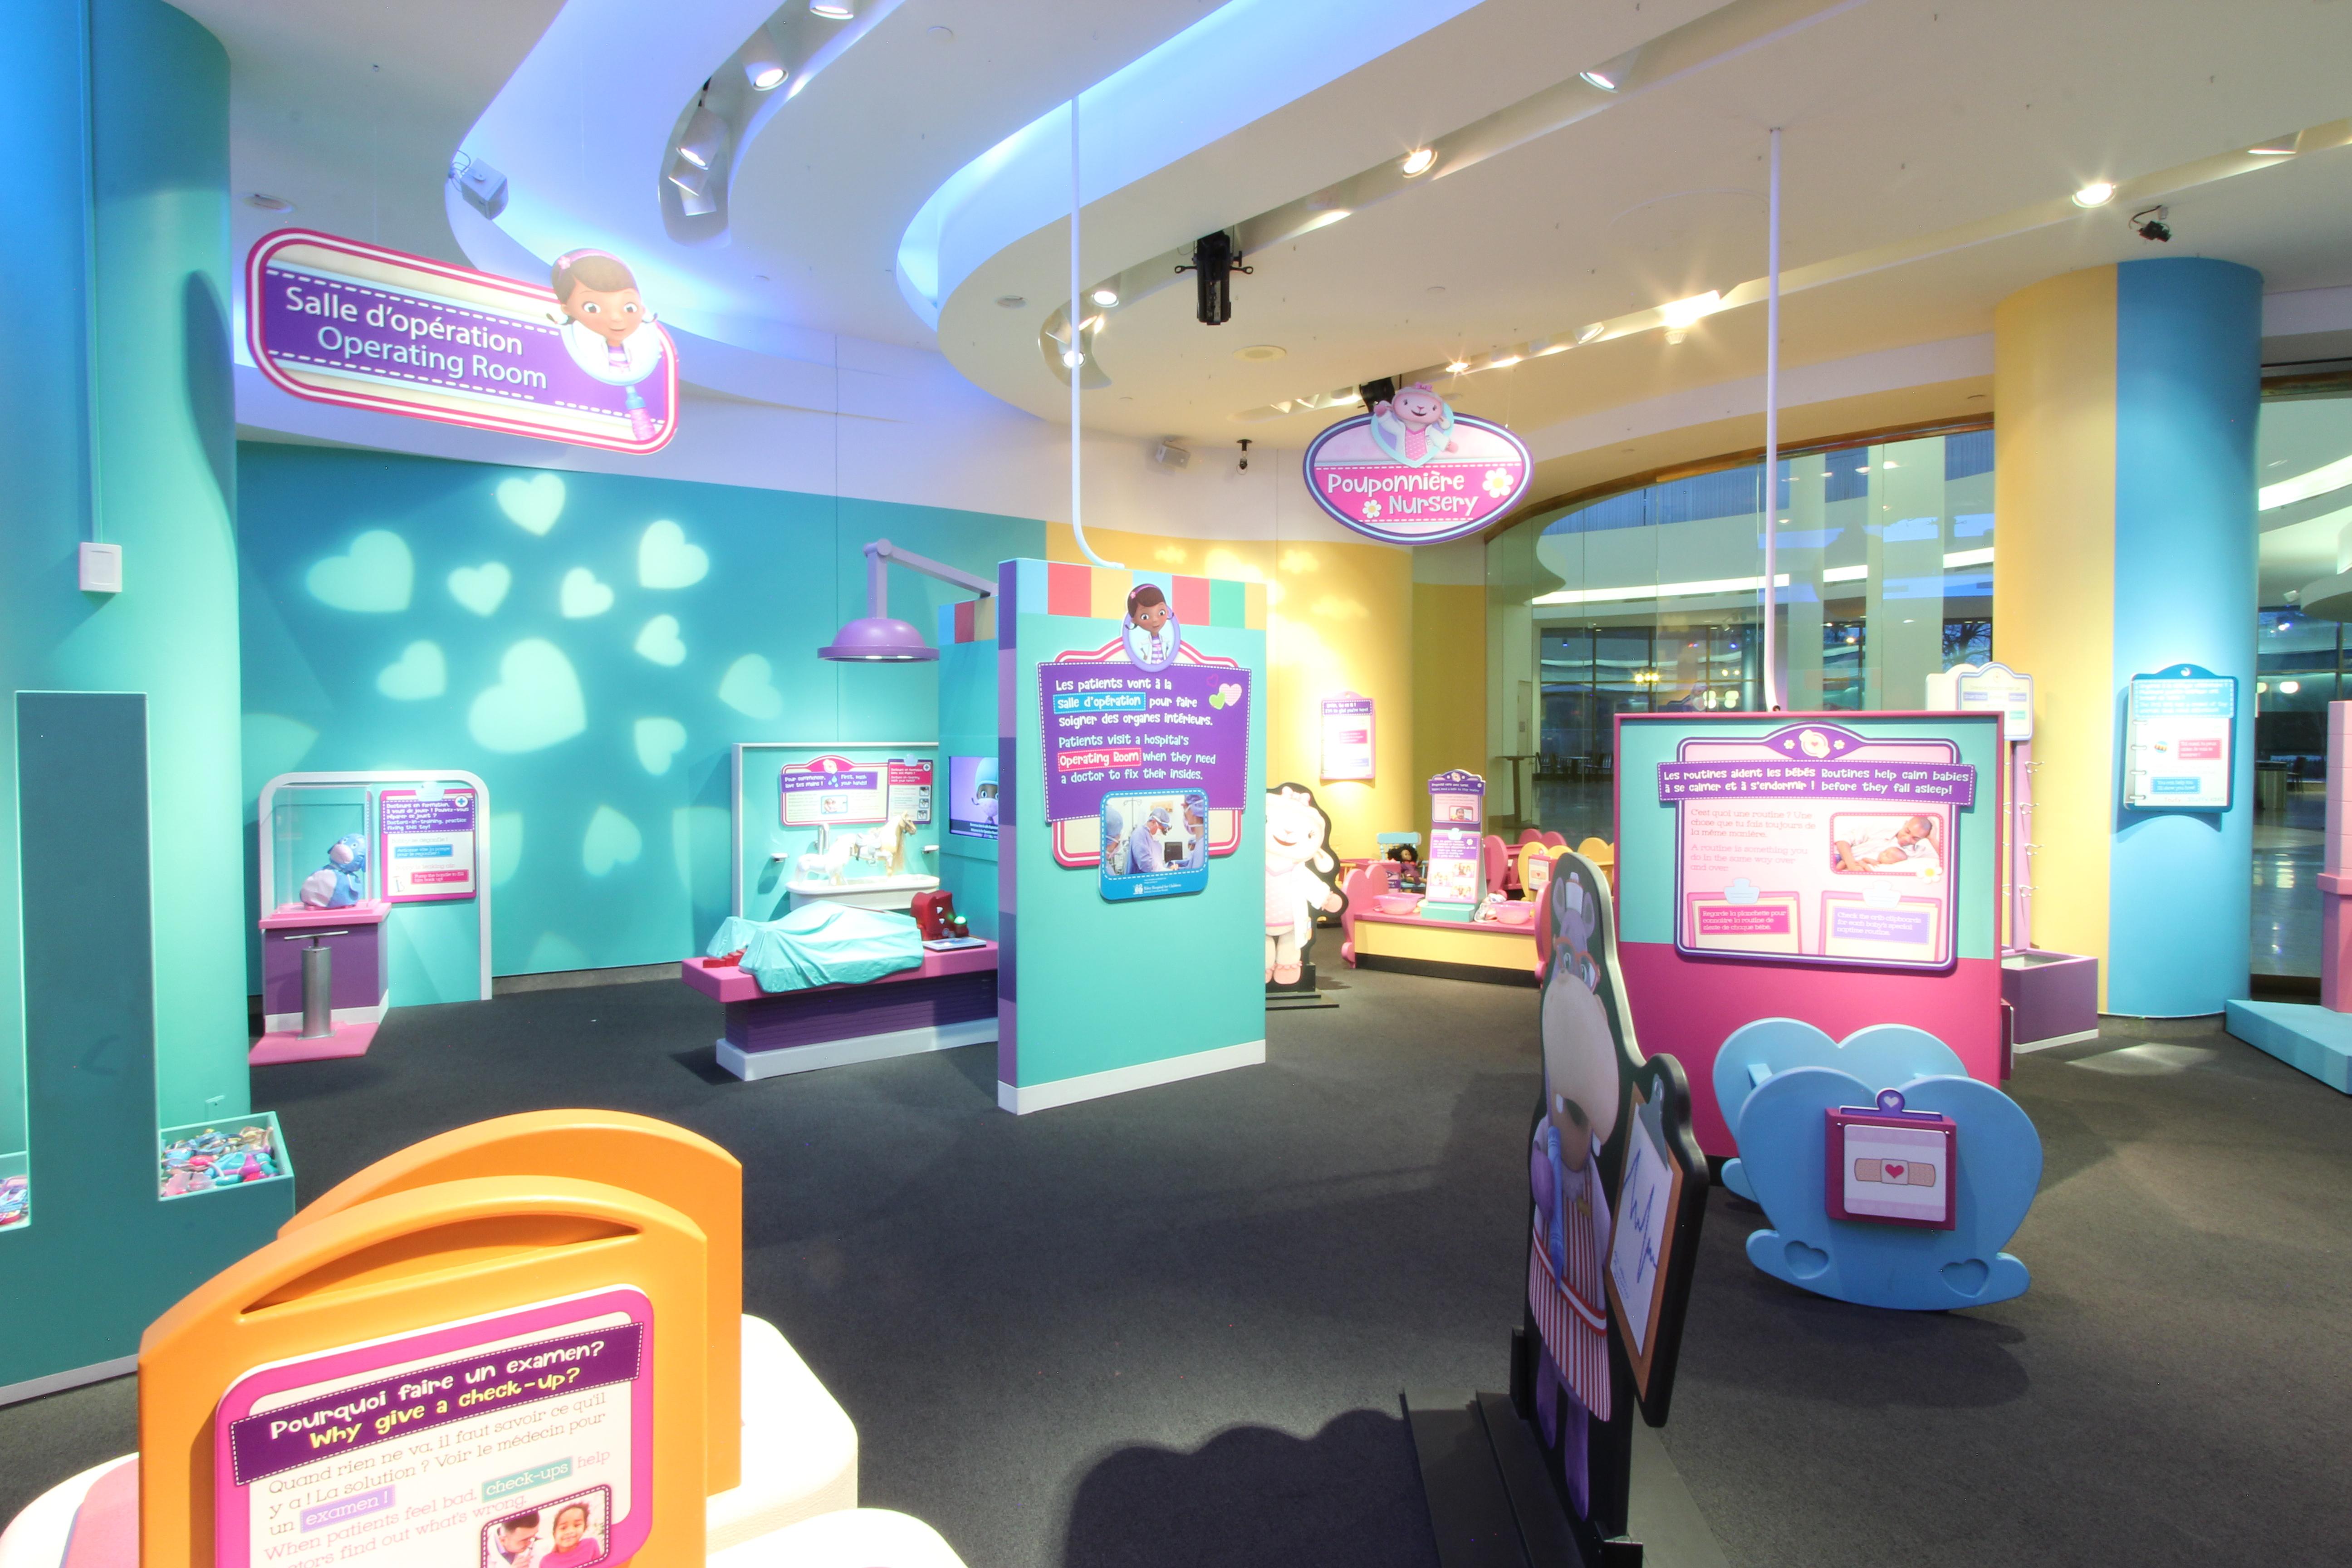 The Doc McStuffins Exhibit at the Canadian Children's Museum